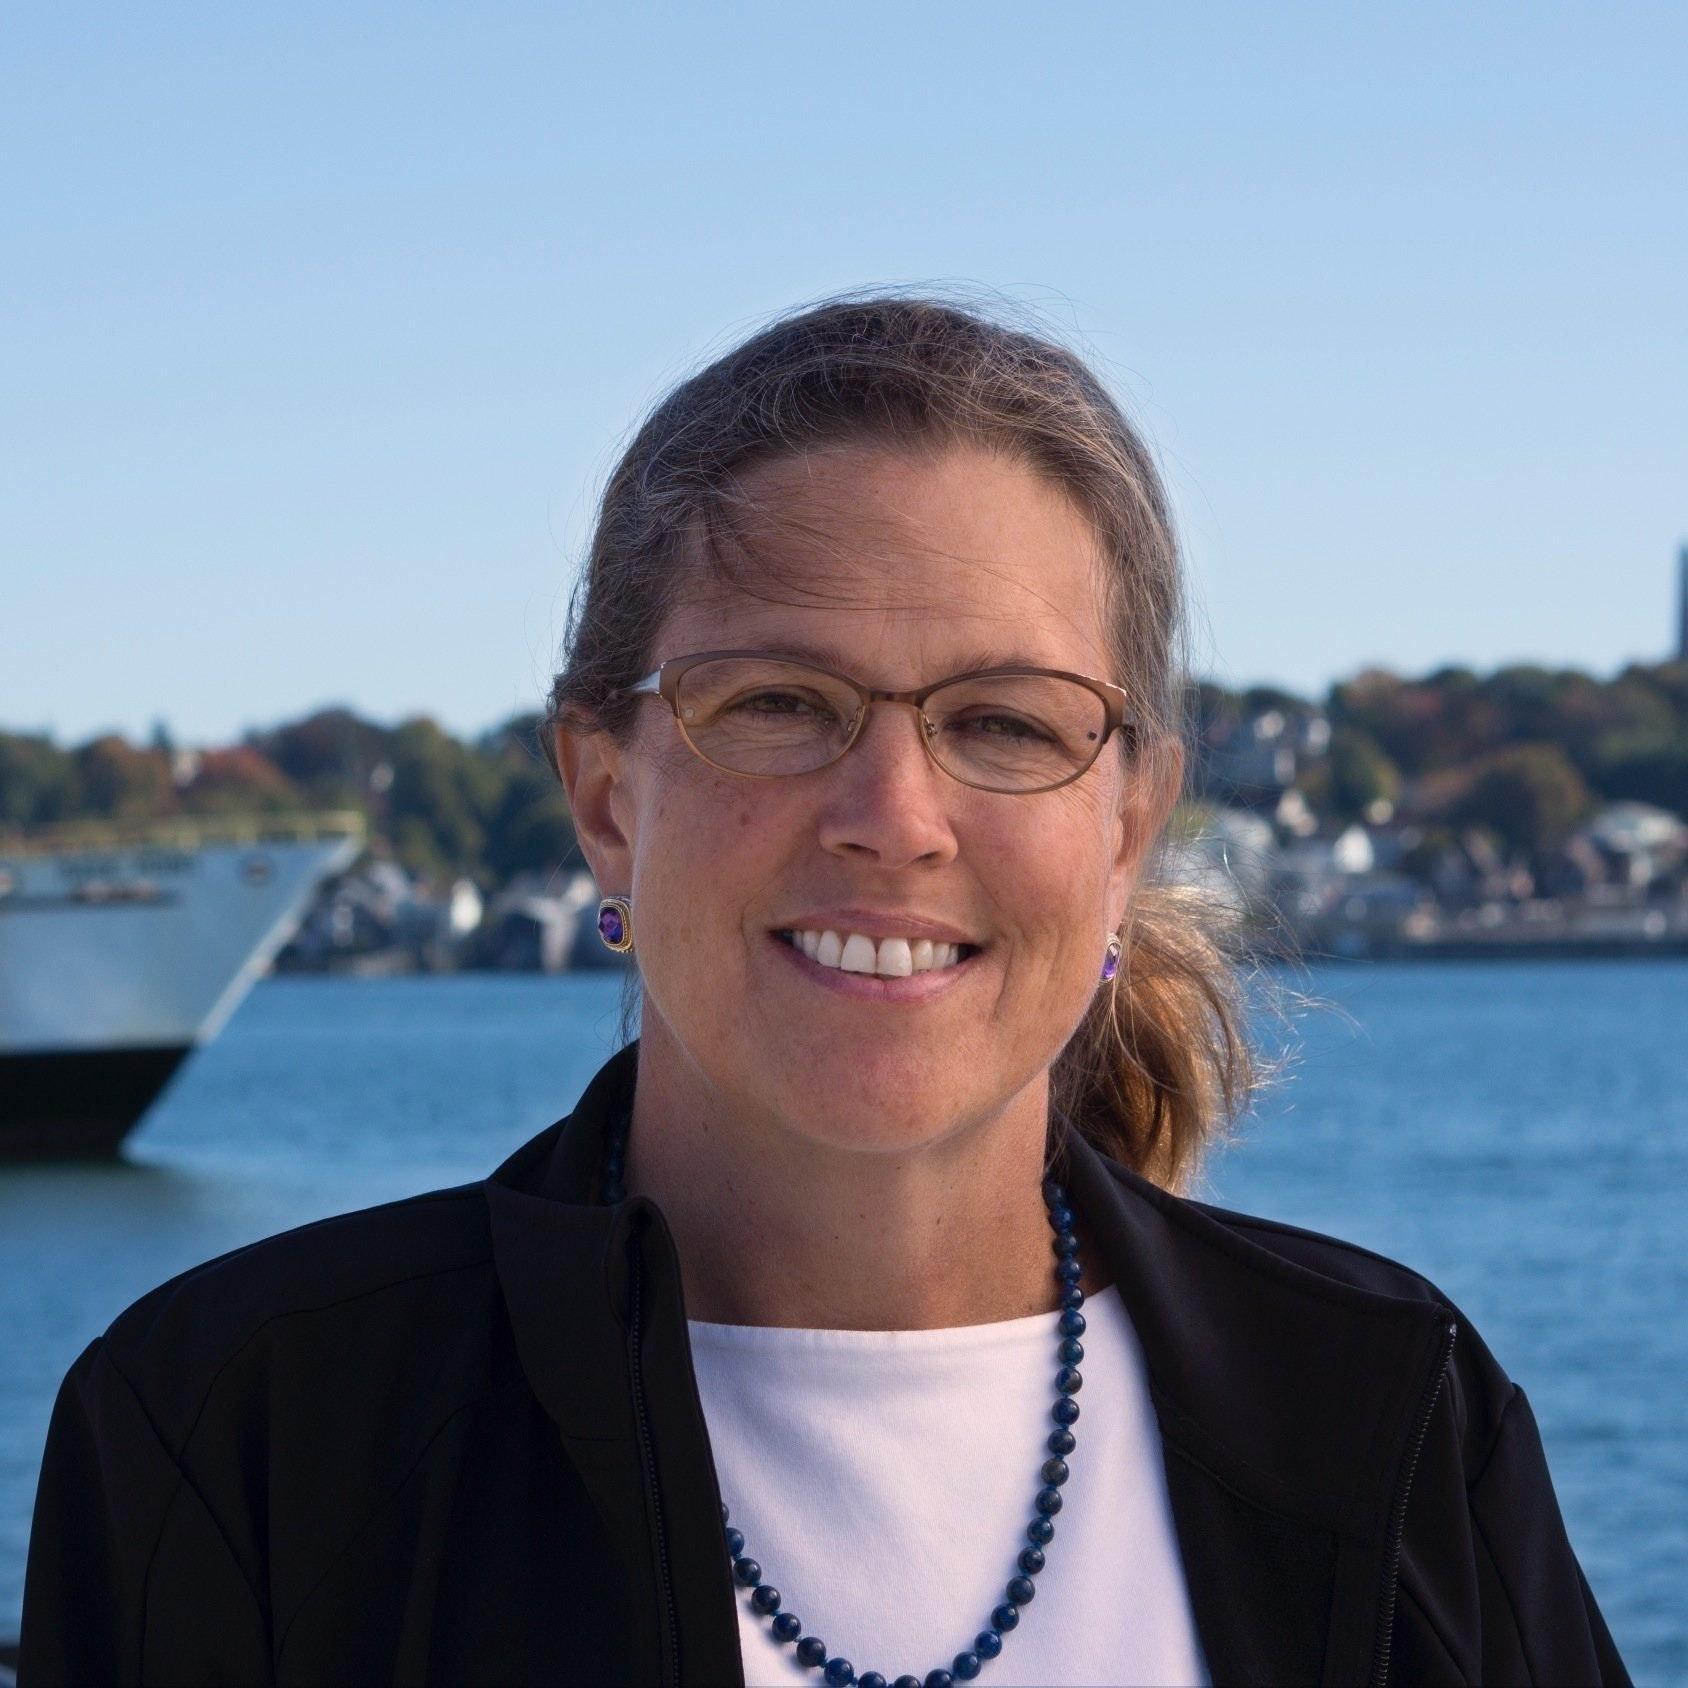 Kristin Harkness